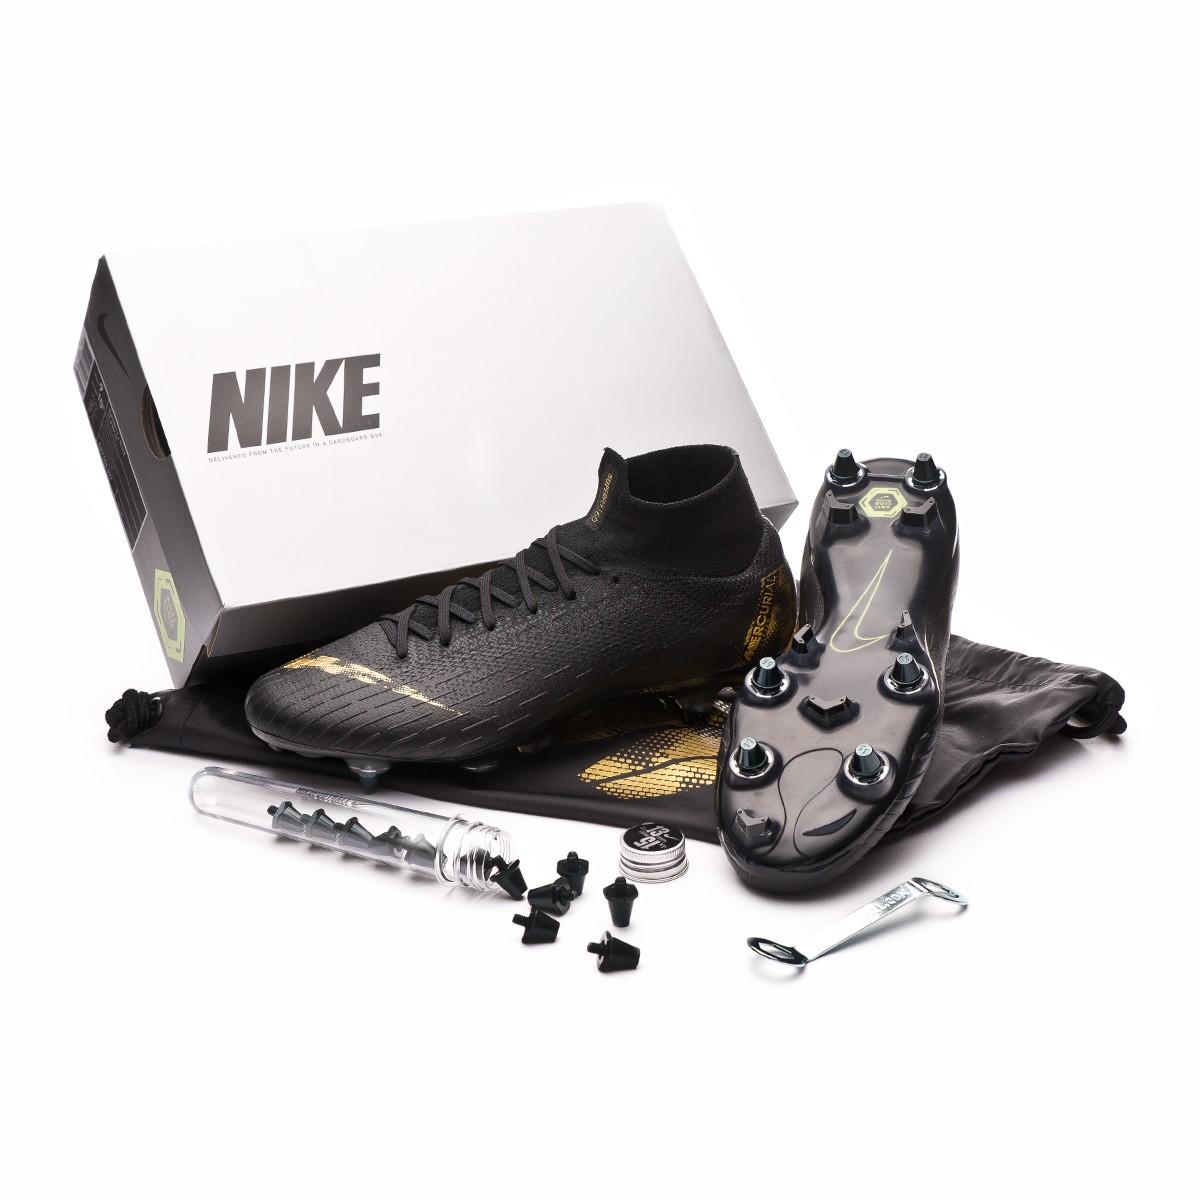 Menagerry mantequilla definido  Football Boots Nike Mercurial Superfly VI Elite Anti-Clog SG-Pro  Black-Metallic vivid gold - Football store Fútbol Emotion